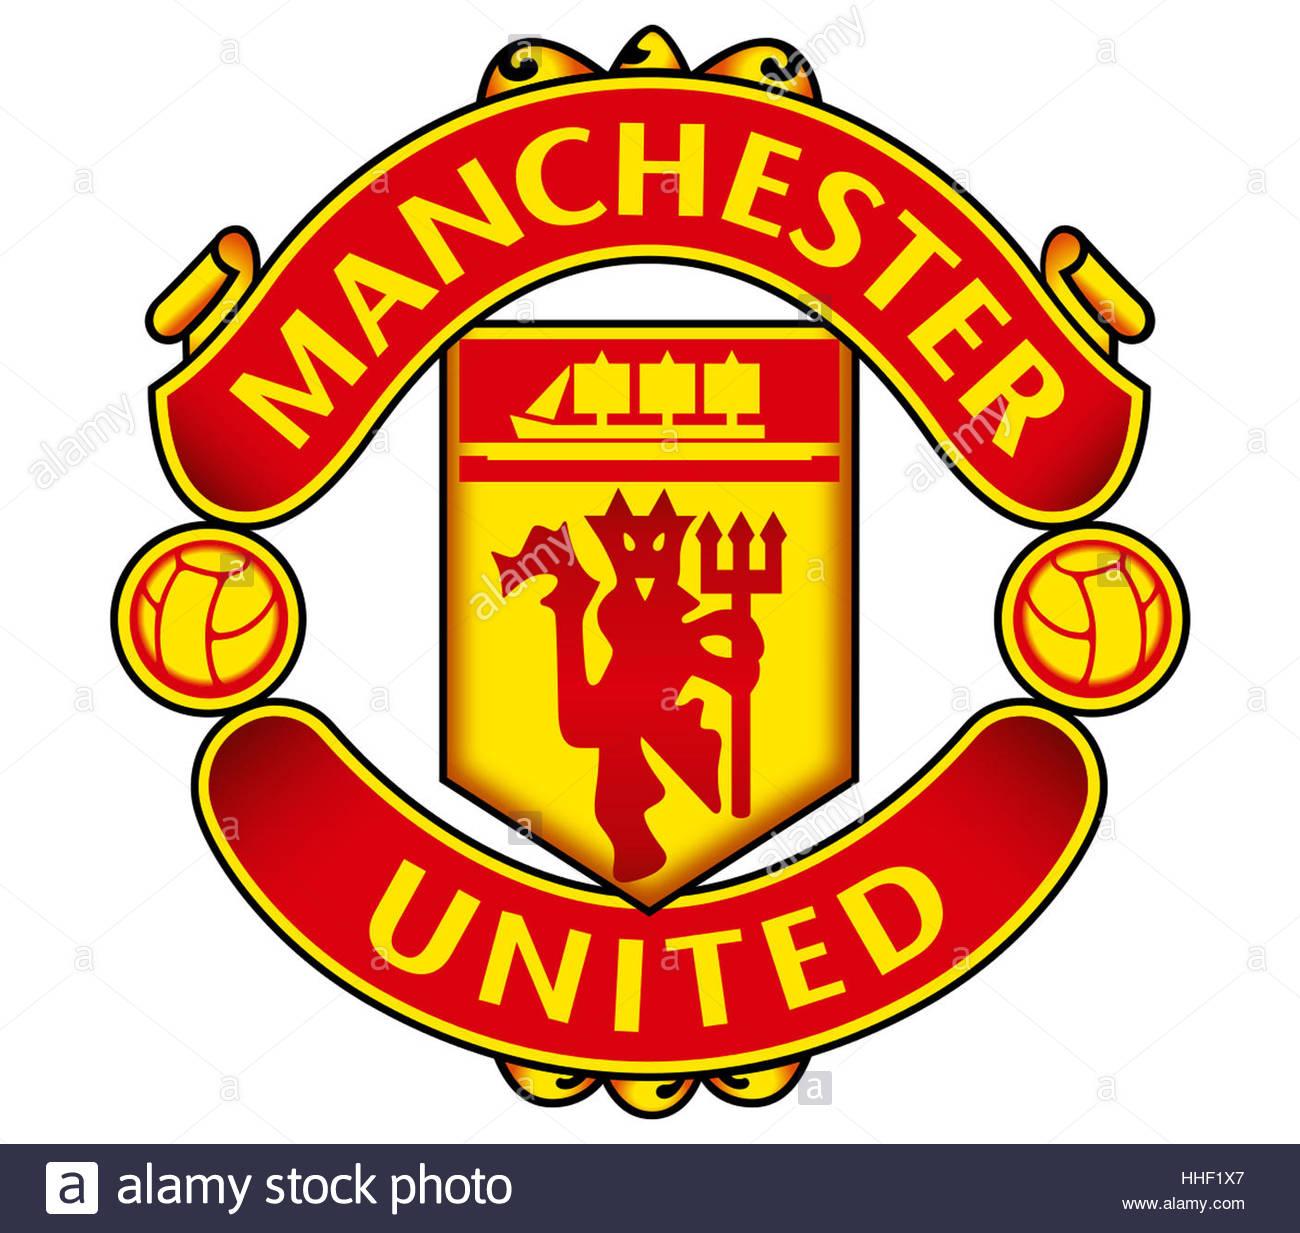 Manchester United icon logo